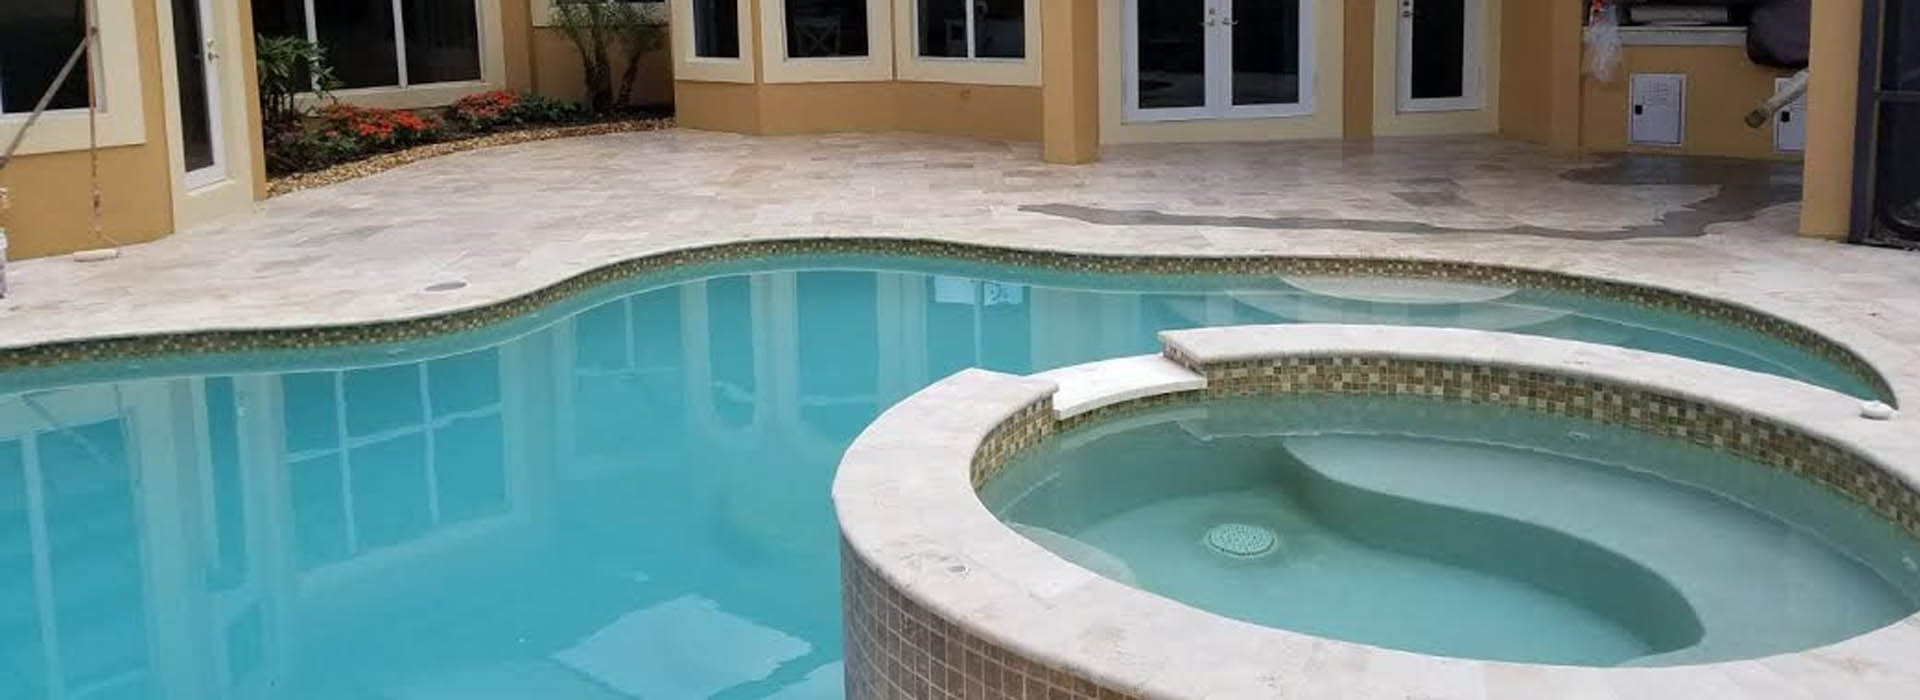 pool deck resurfacing fl concrete